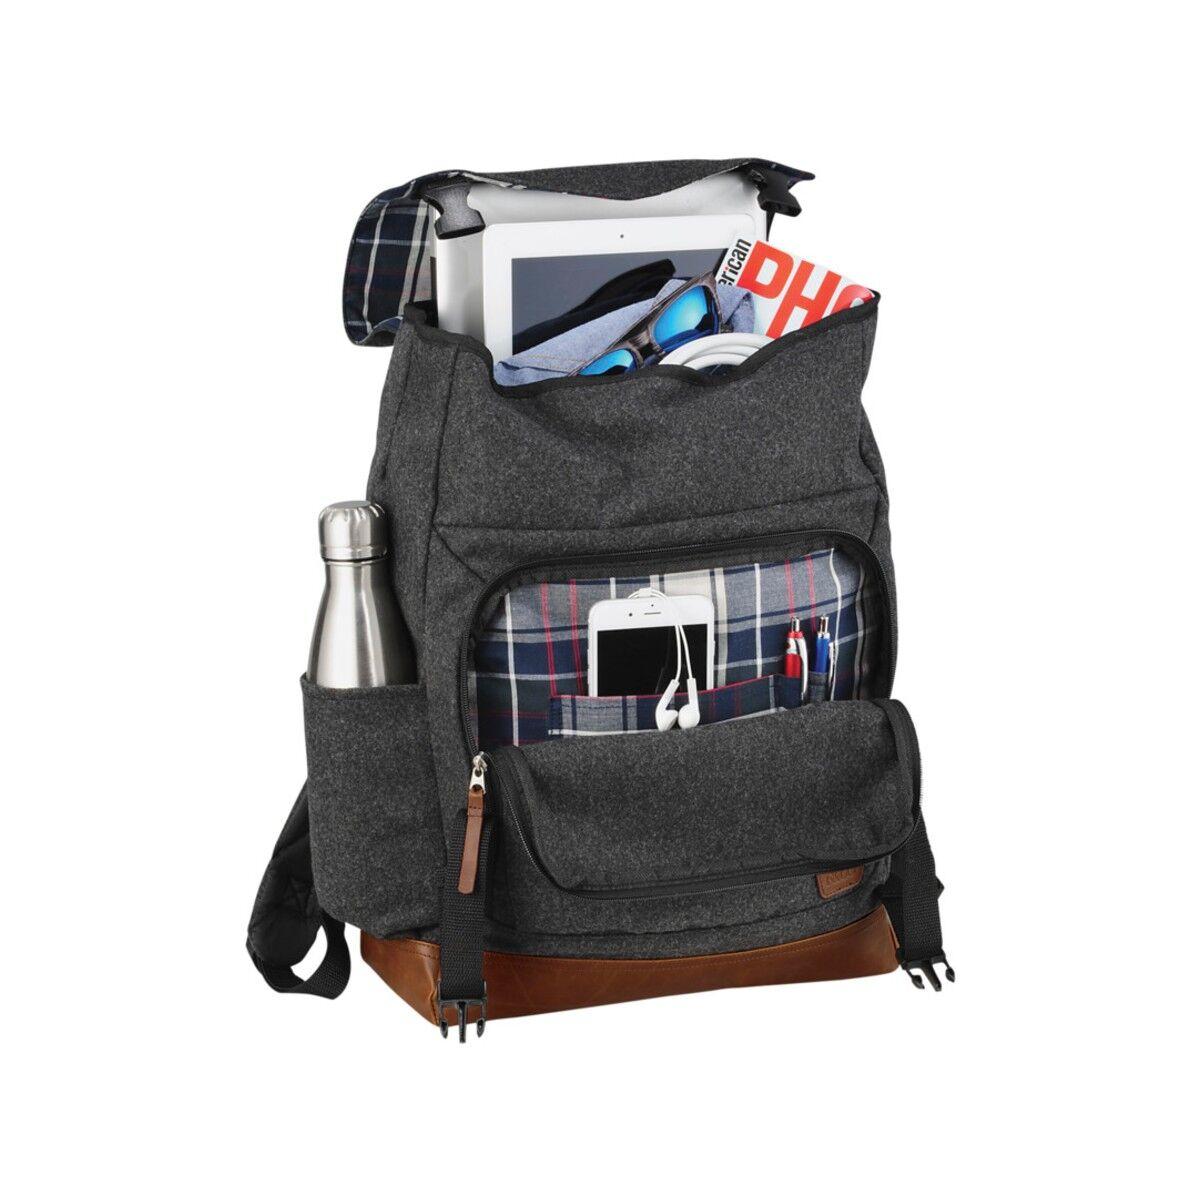 Retro Laptop Backpack